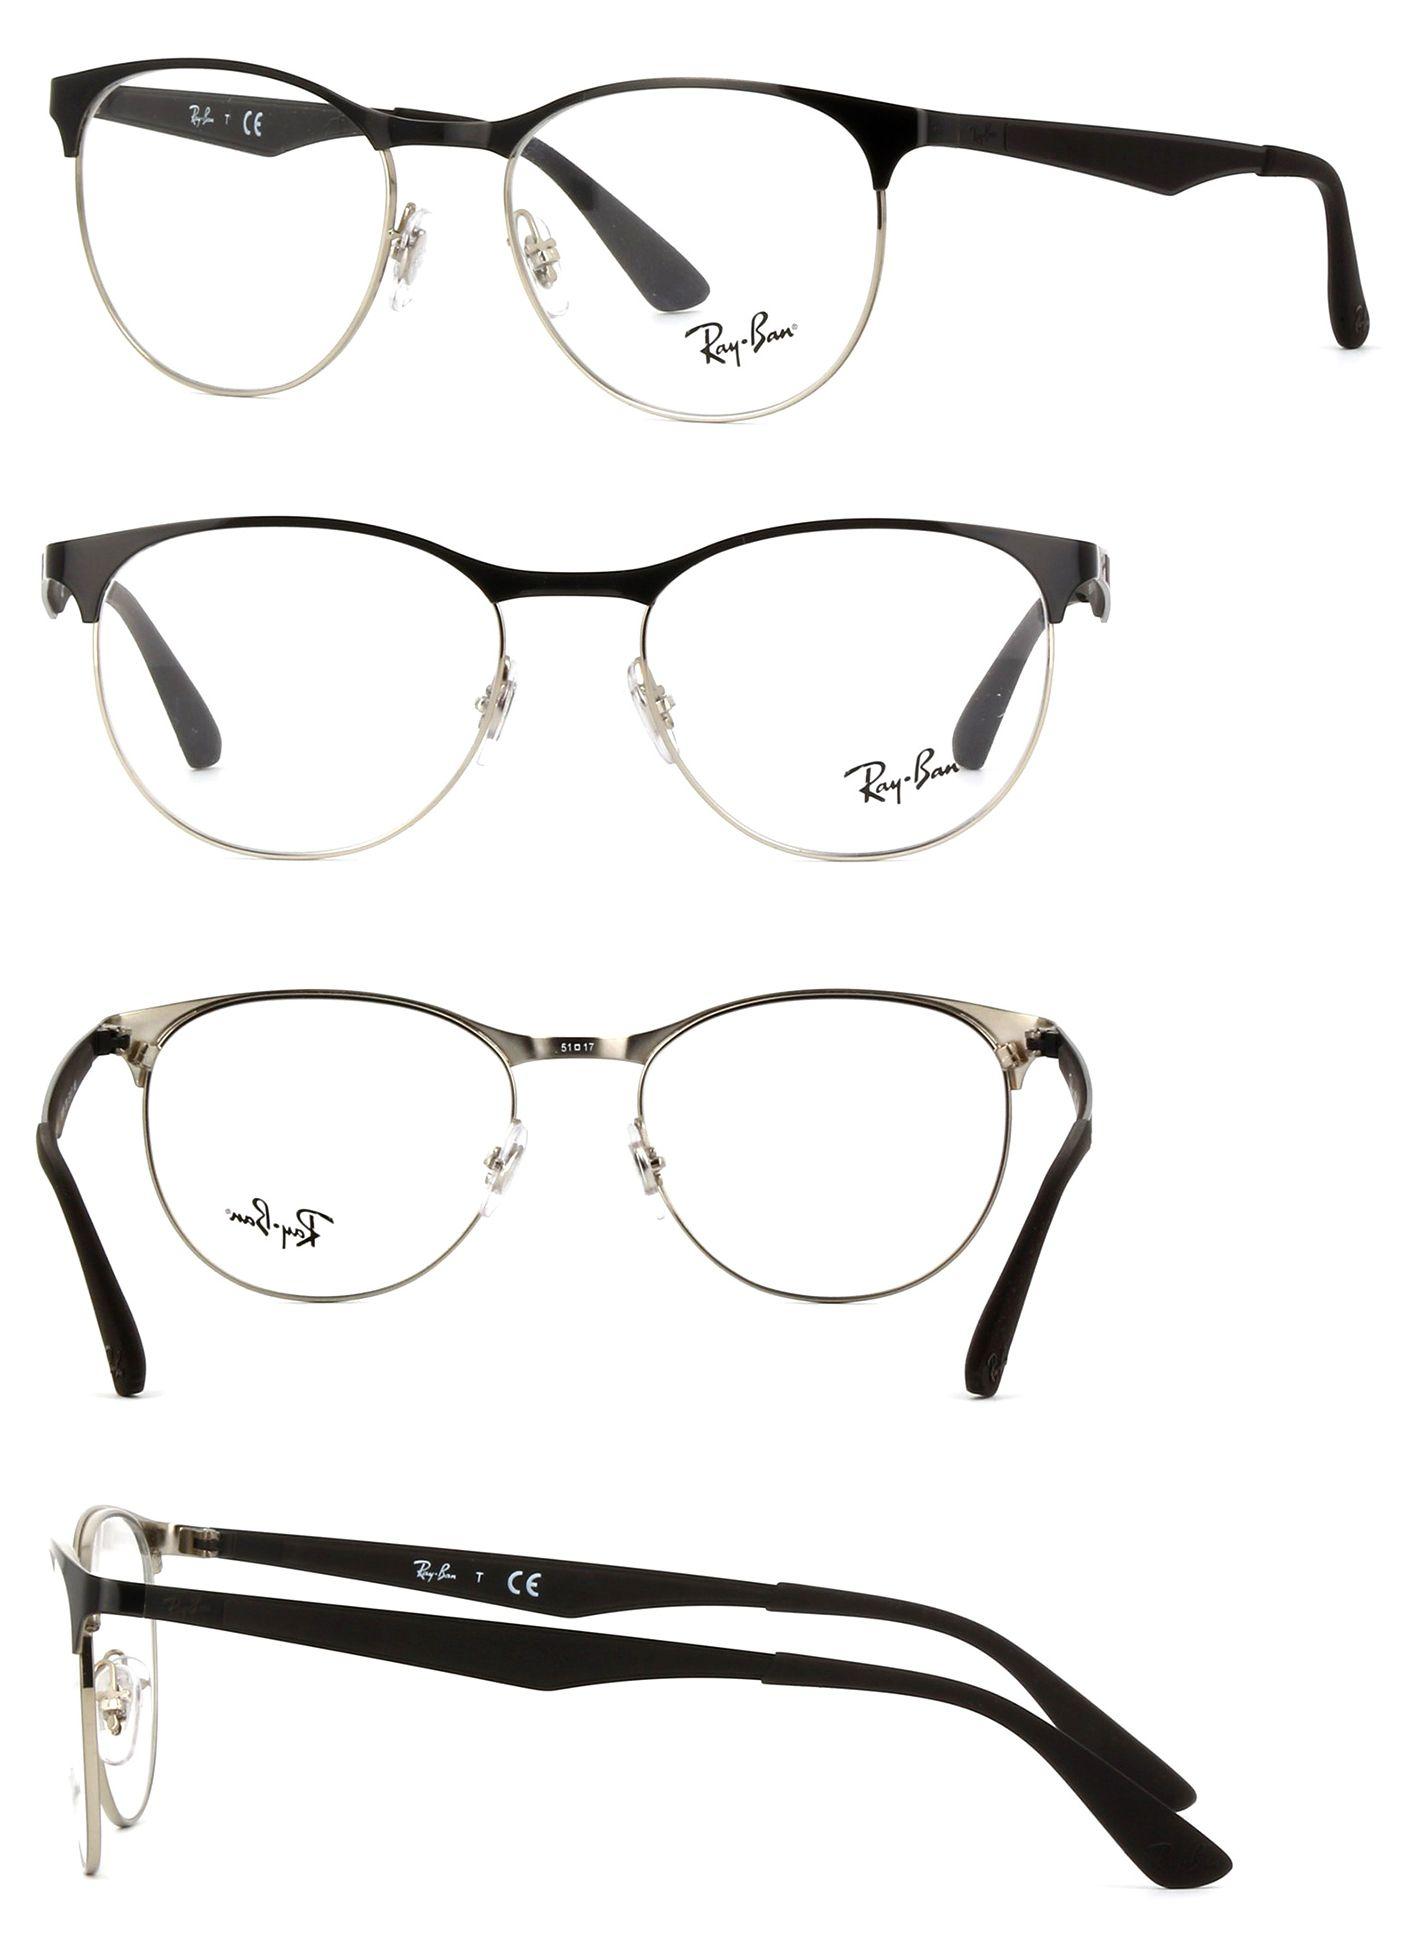 0d220d39961 Eyeglass Frames  New Authentic Ray Ban Eyeglasses Rb6365 2861 Silver Black  51-17-